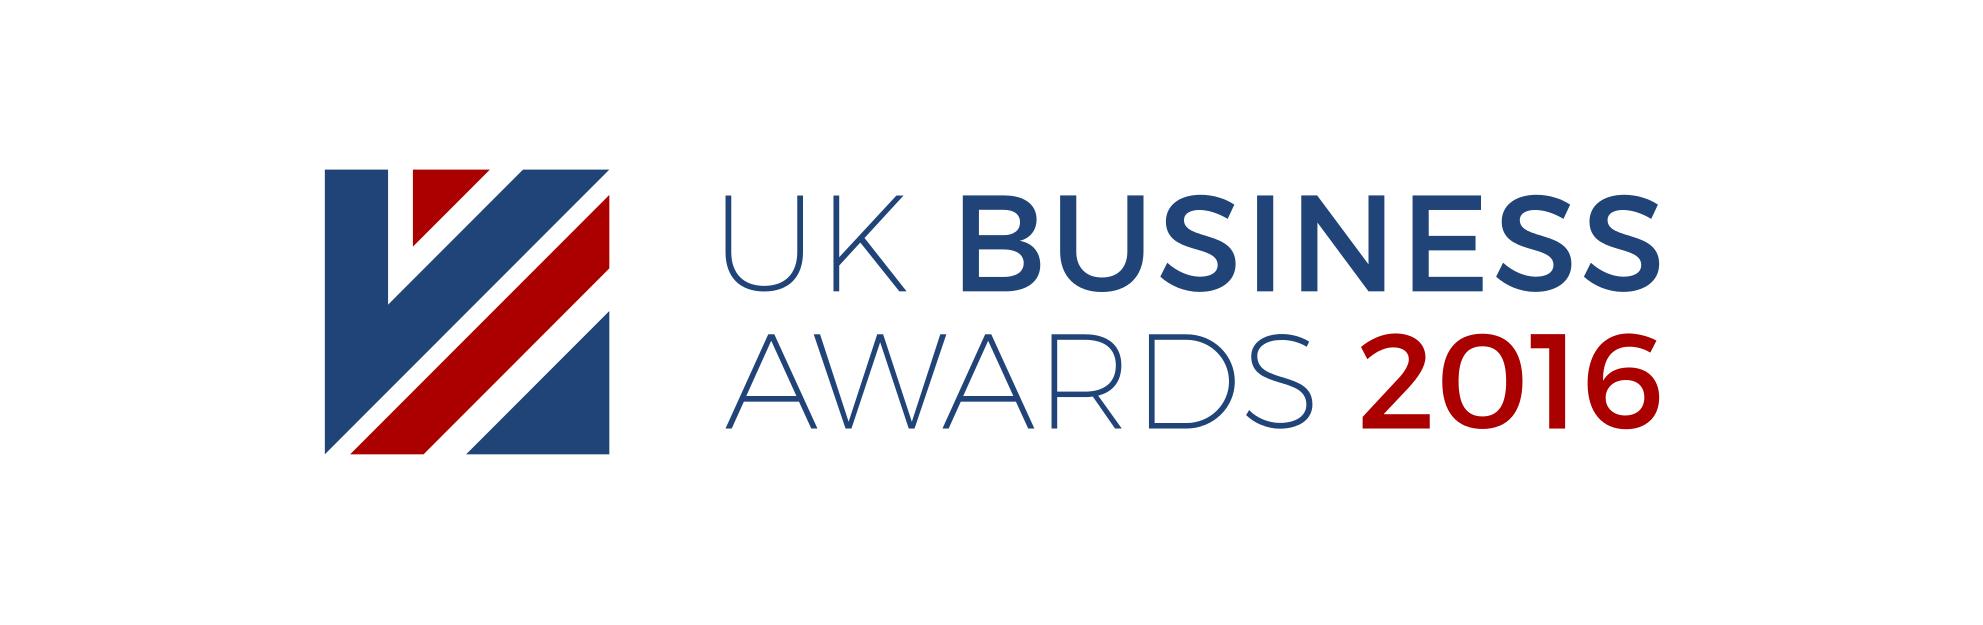 uk_business_awards_wide